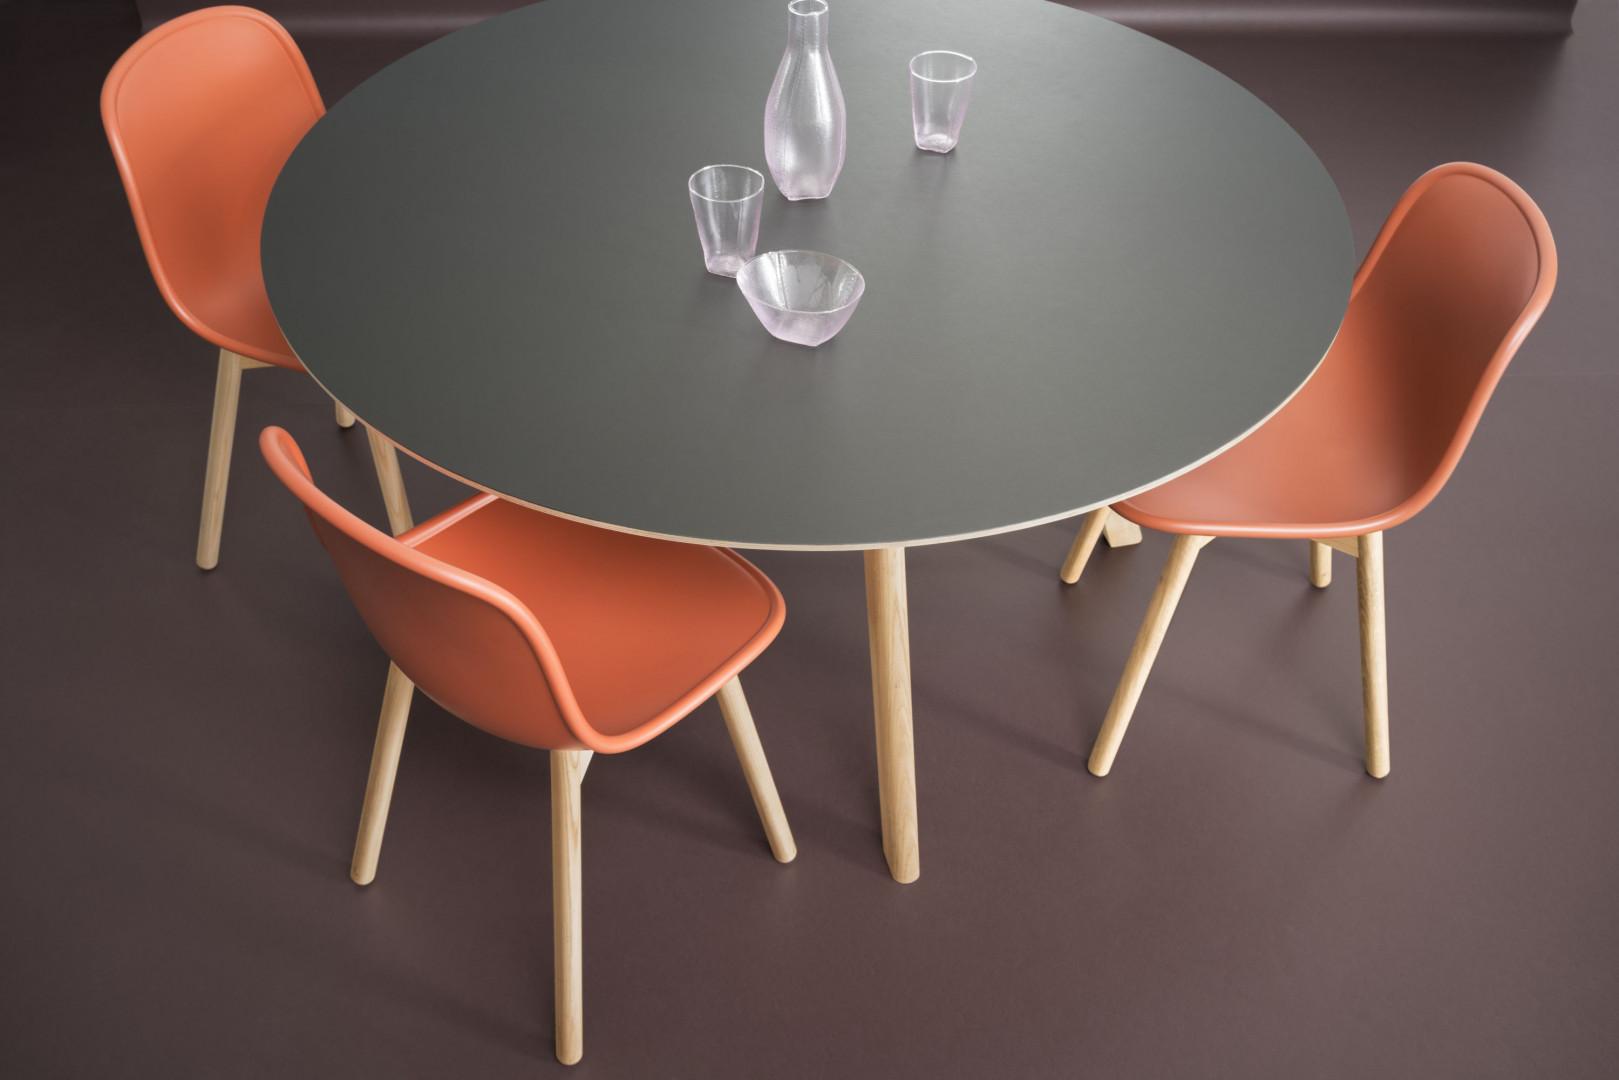 Furniture Linoleum na blacie stołu. Fot. Forbo